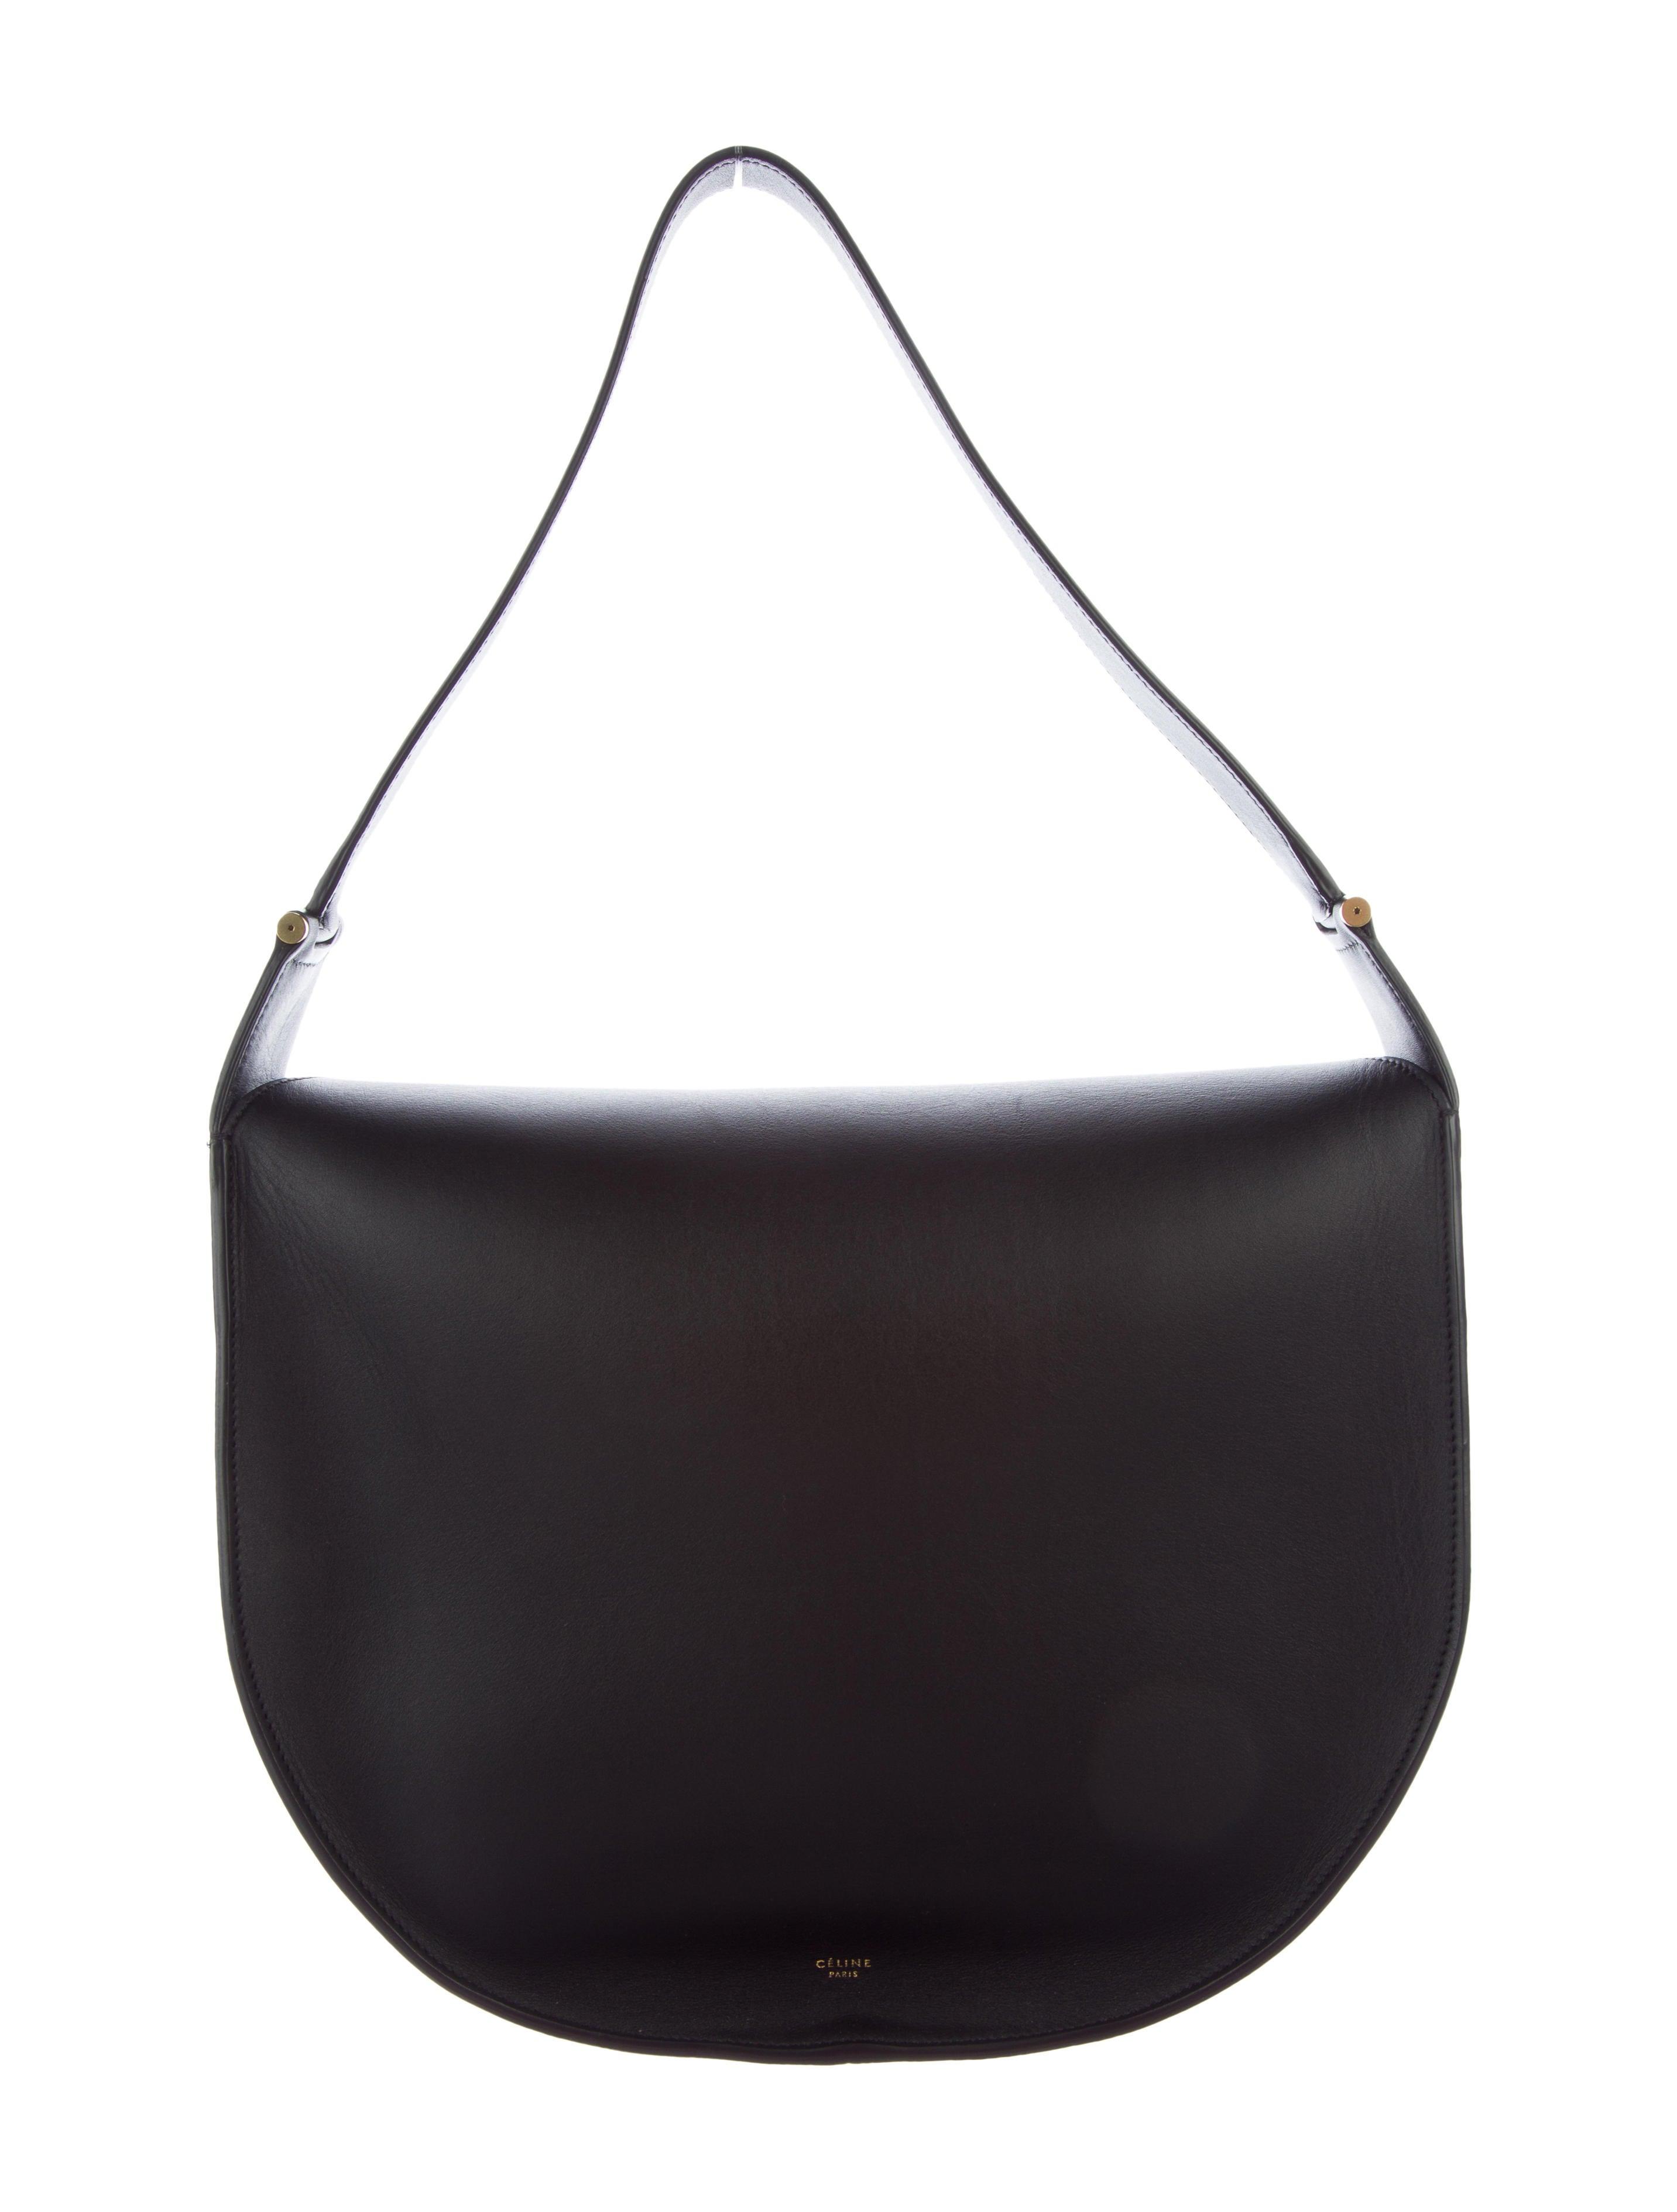 Bag Cel55163 Céline Flap Celine Round Handbags 2016 SVUzpM